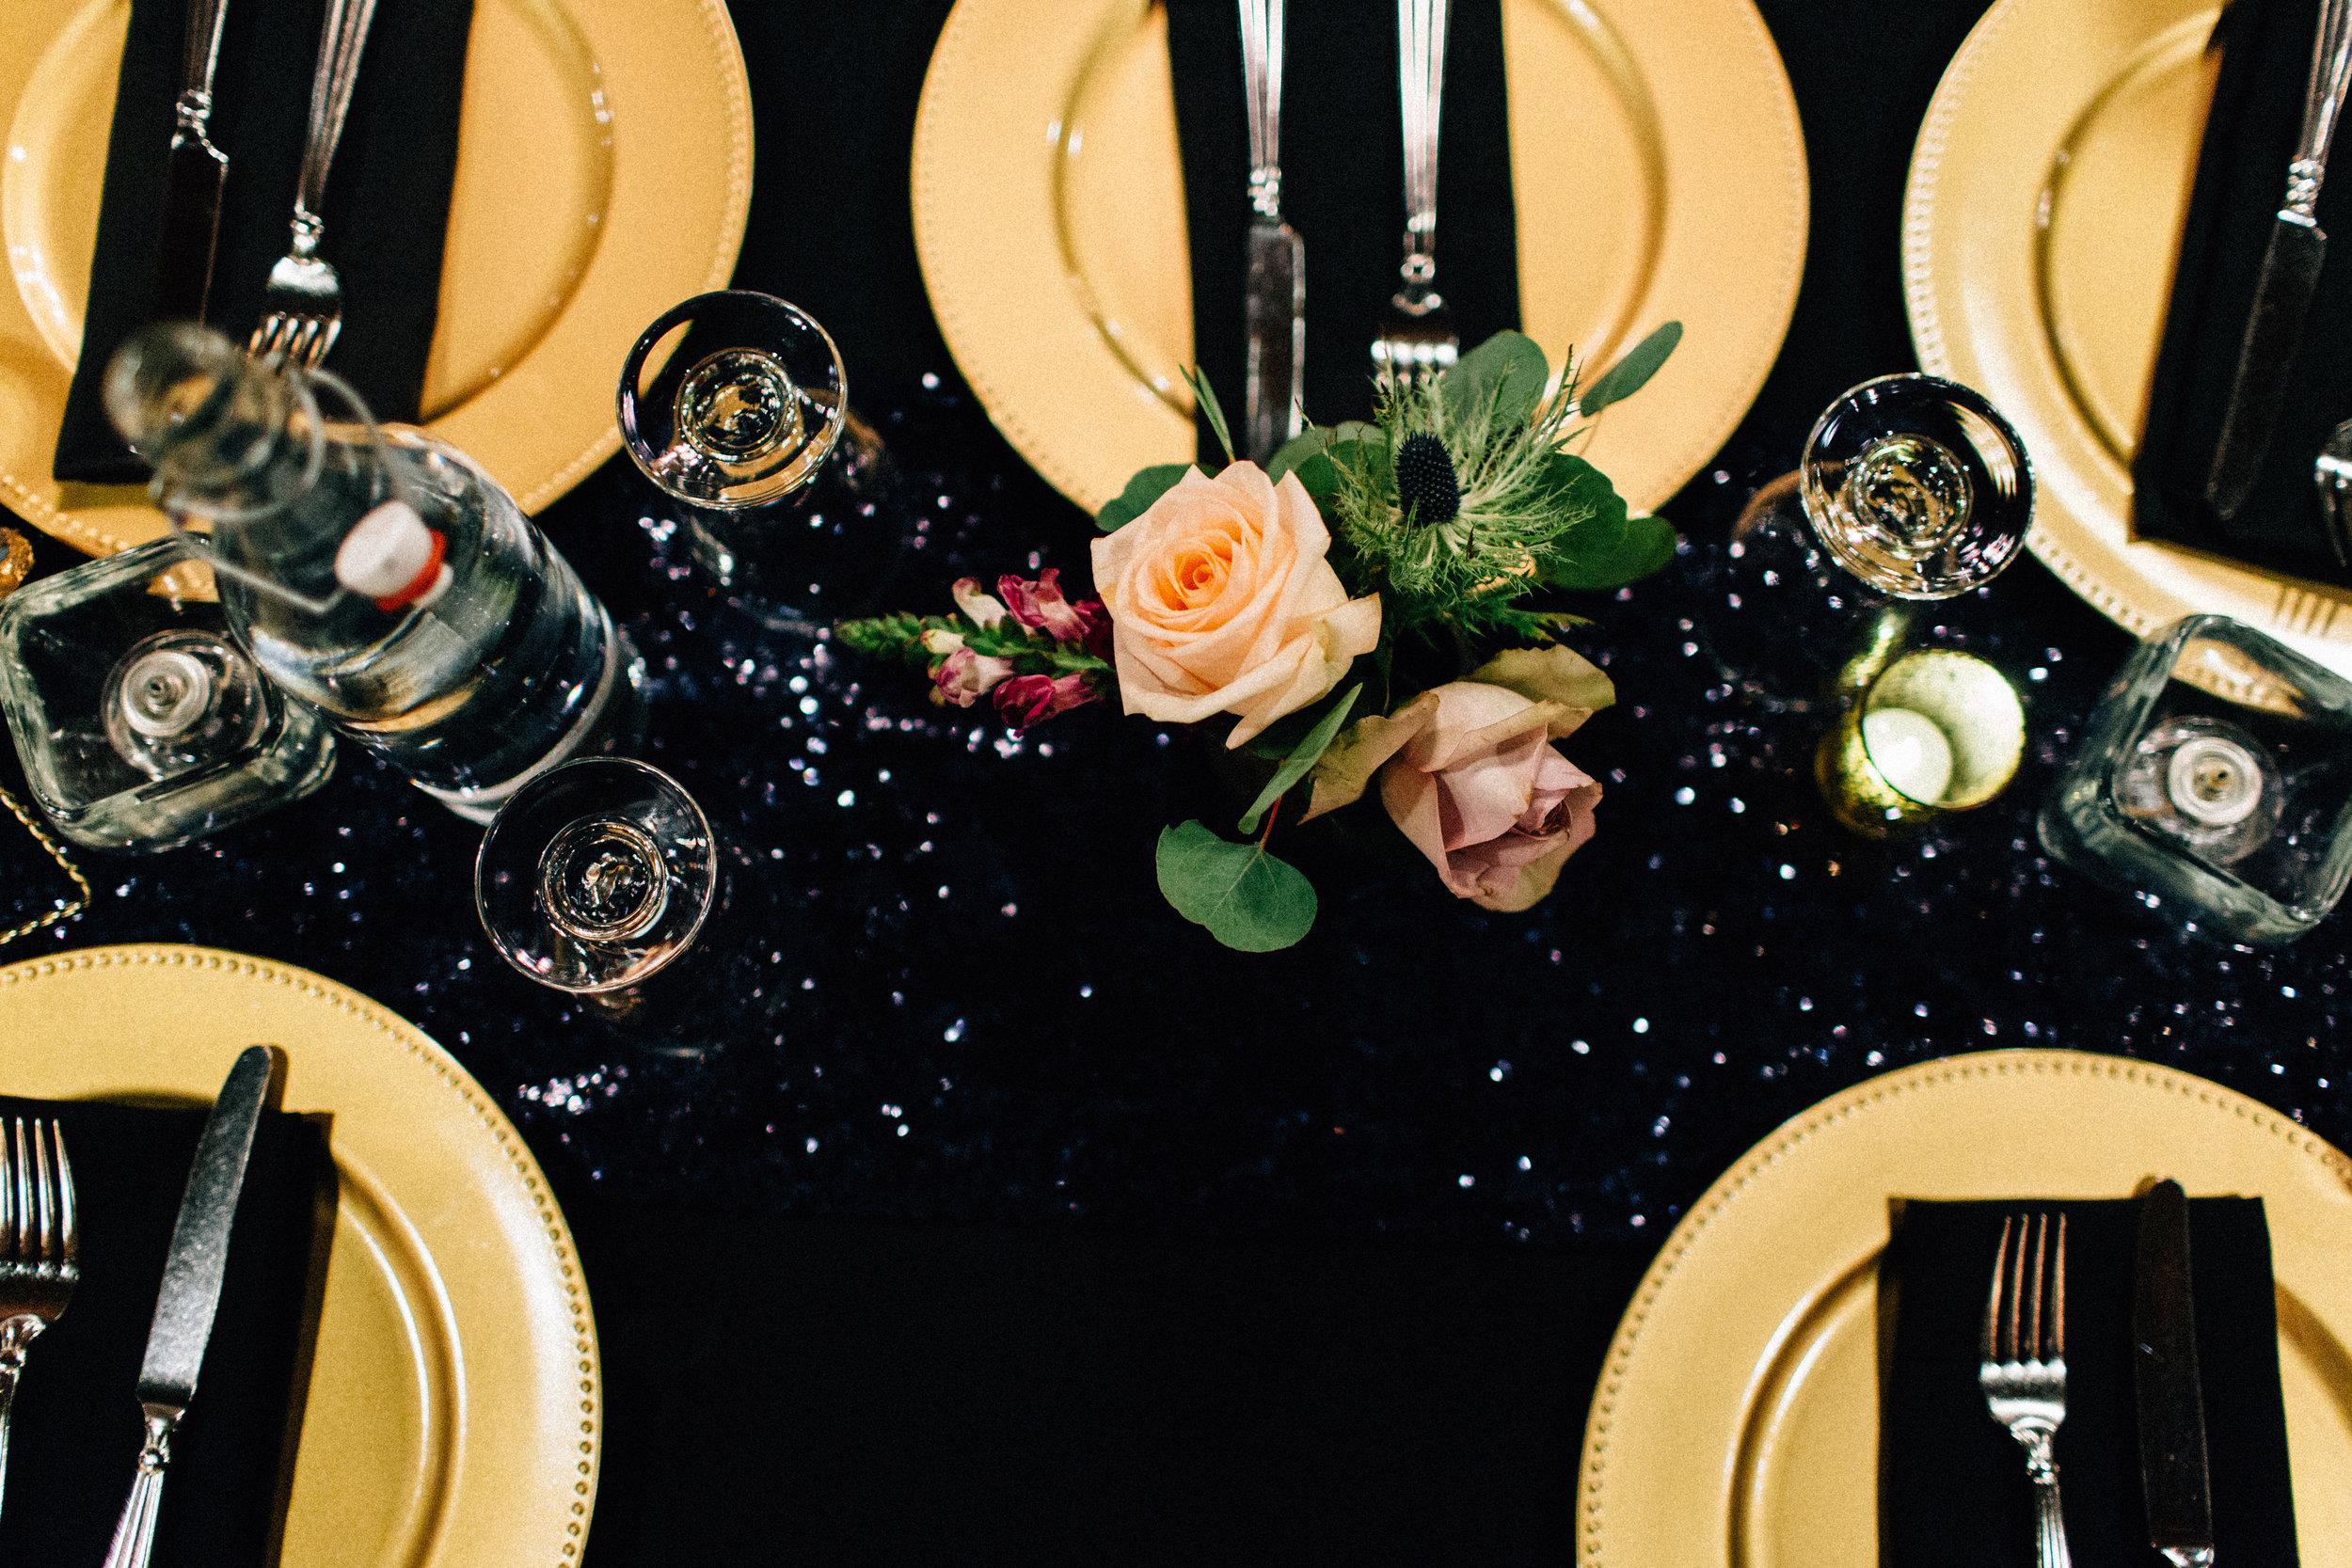 Abram-Jenn-Lake-Union-Cafe-Wedding-7396.jpg